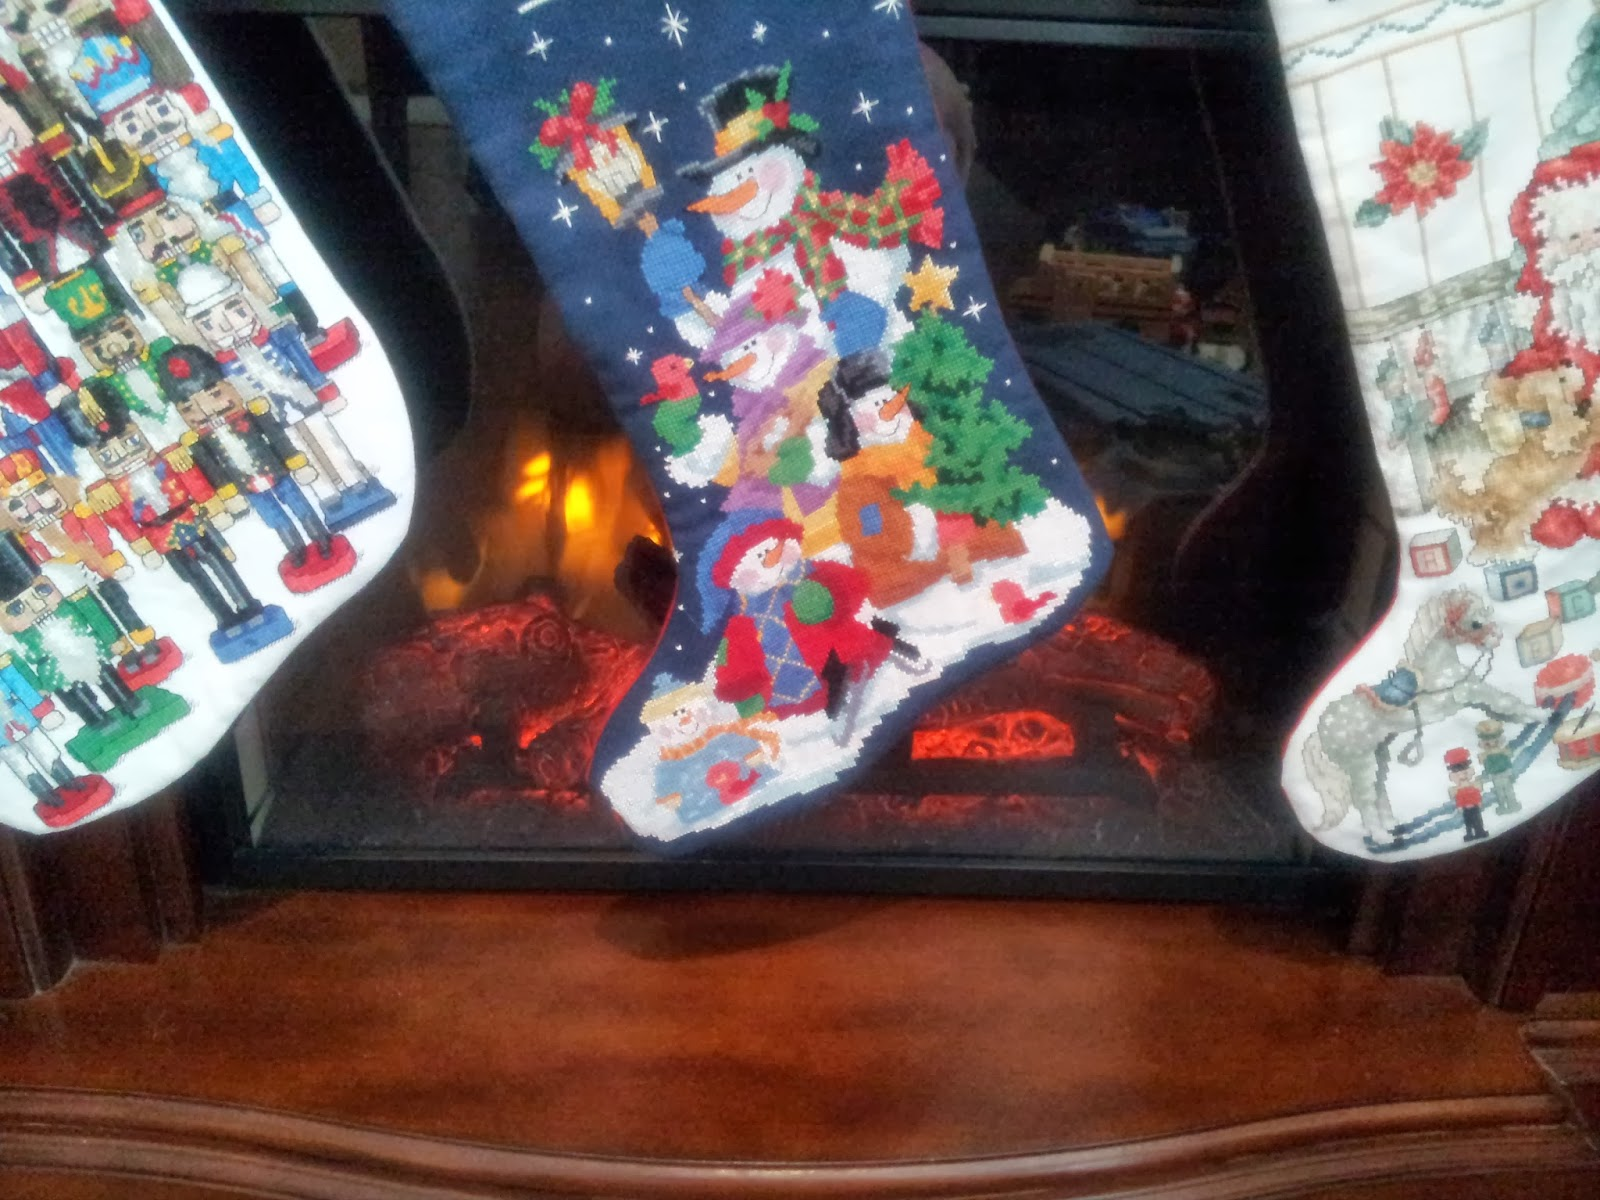 cross-stitch, embroidery, kids, fireplace, tradition,